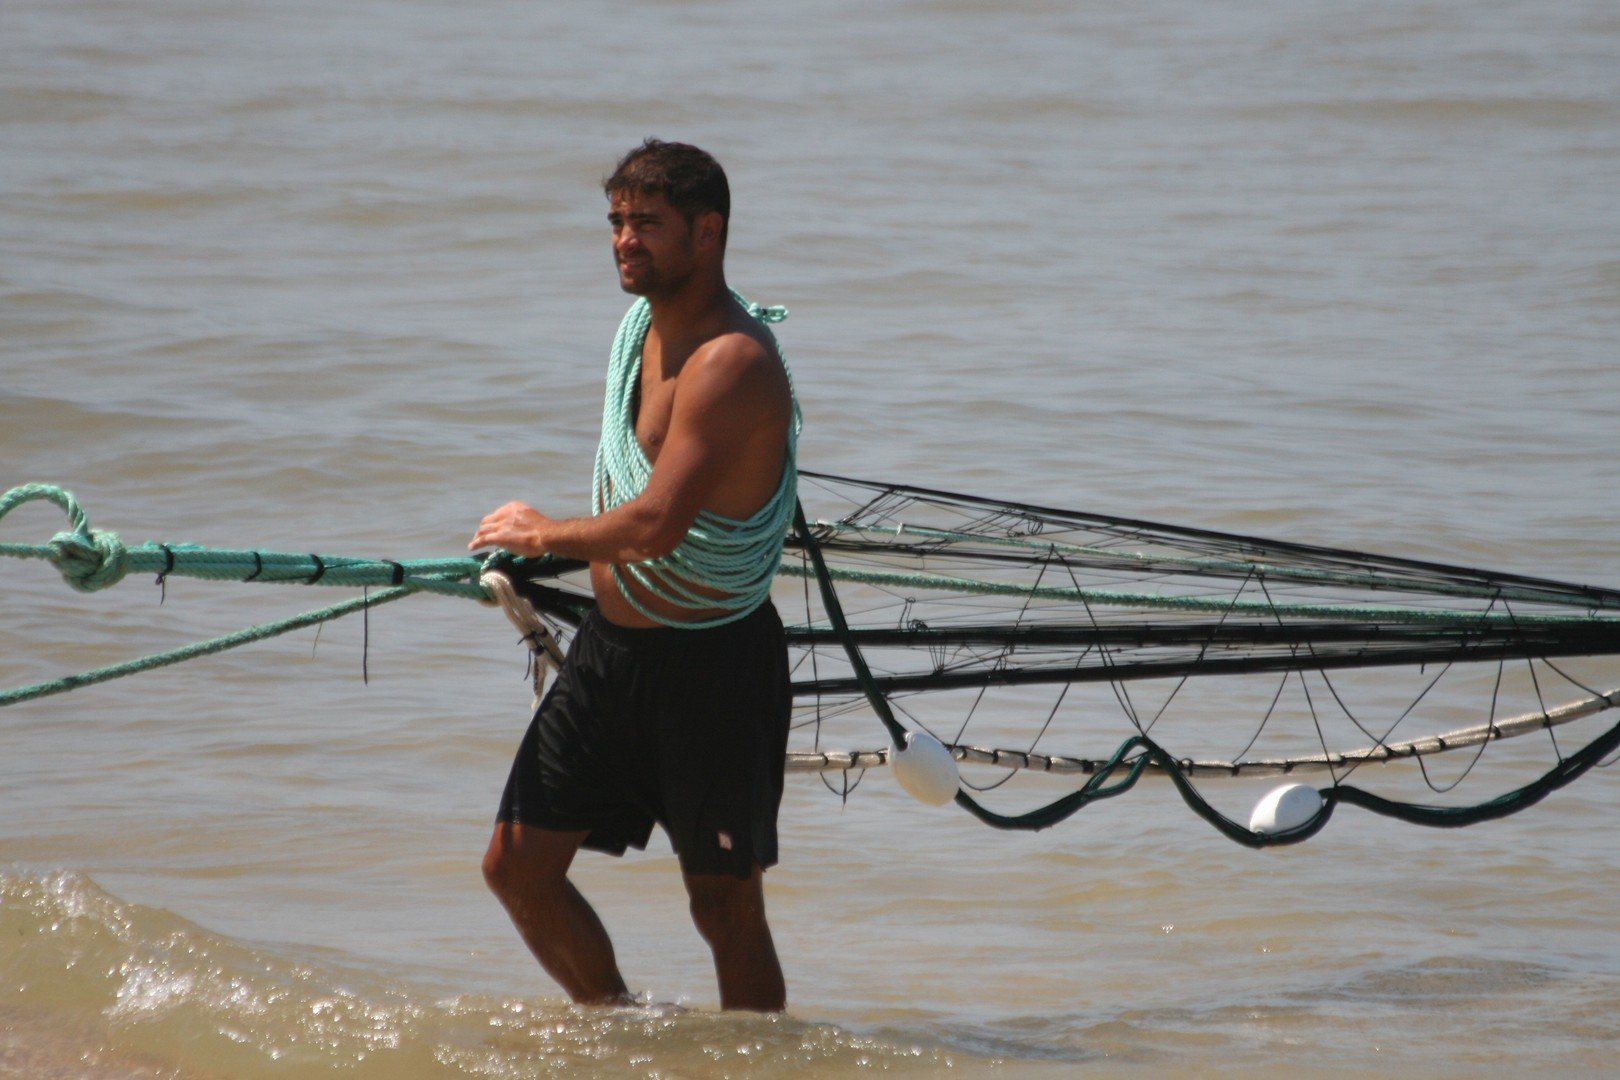 Pêcheur au Portugal